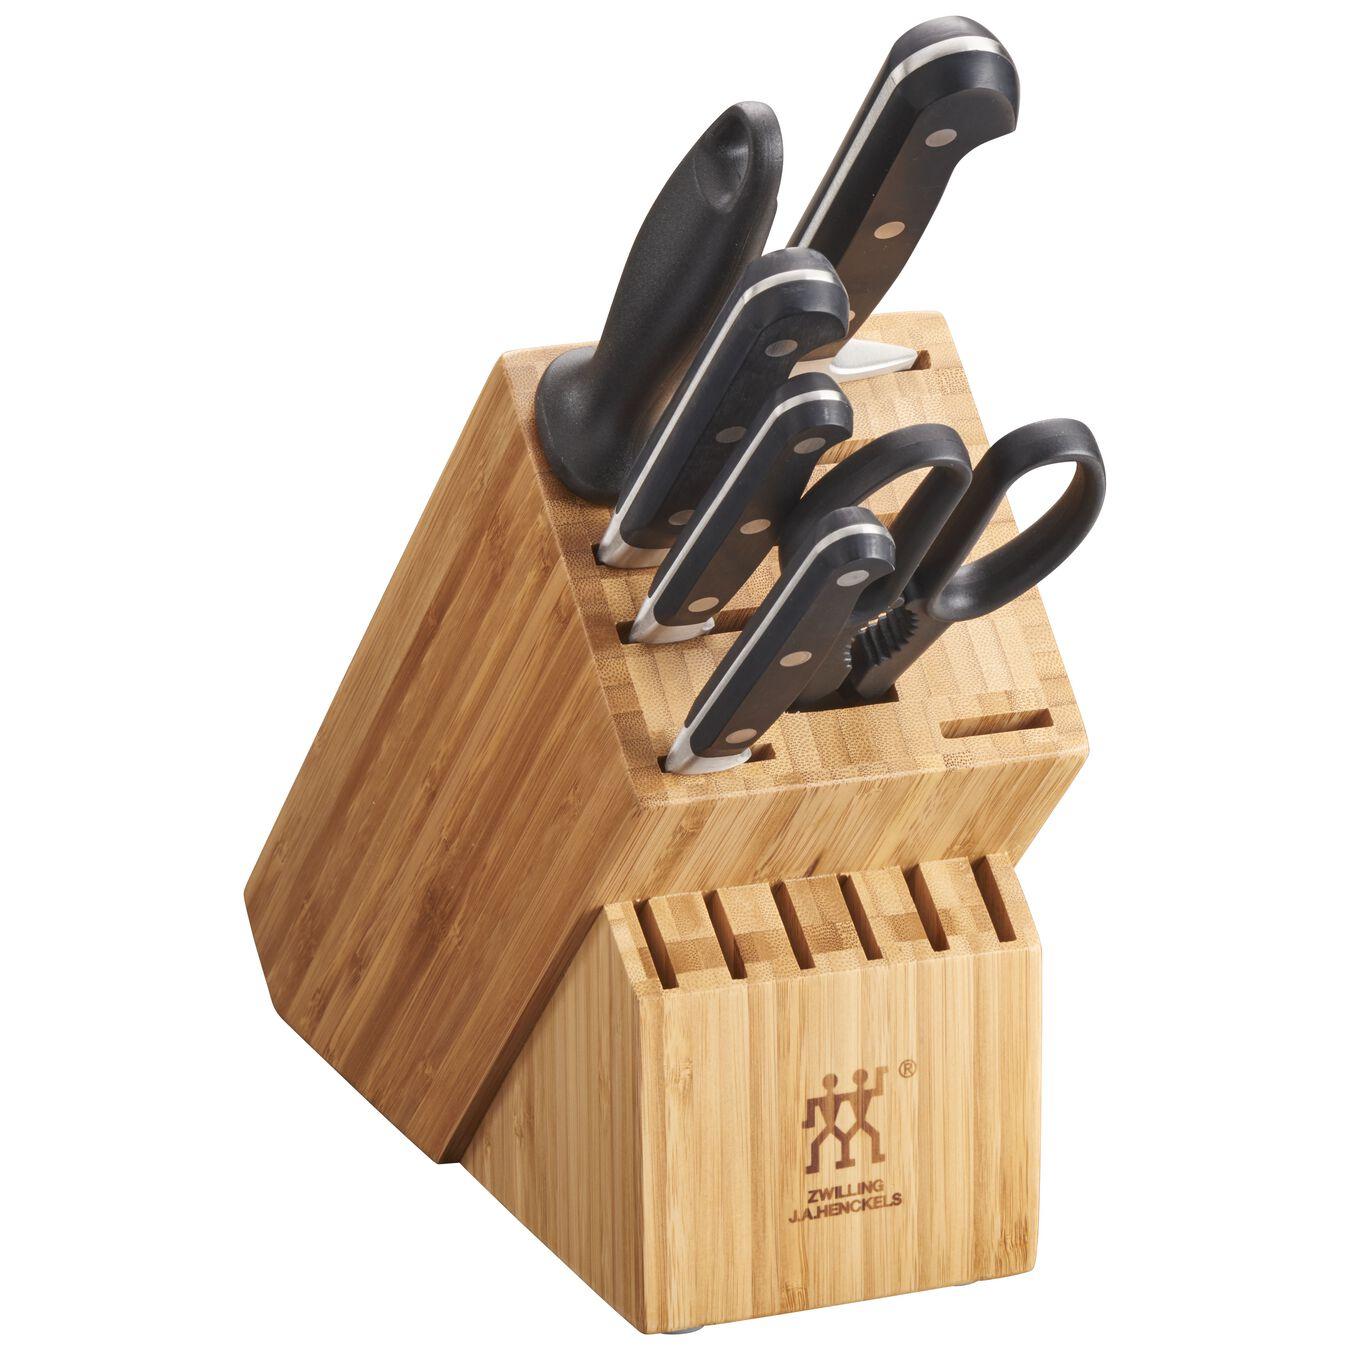 7-pc Knife Block Set,,large 2